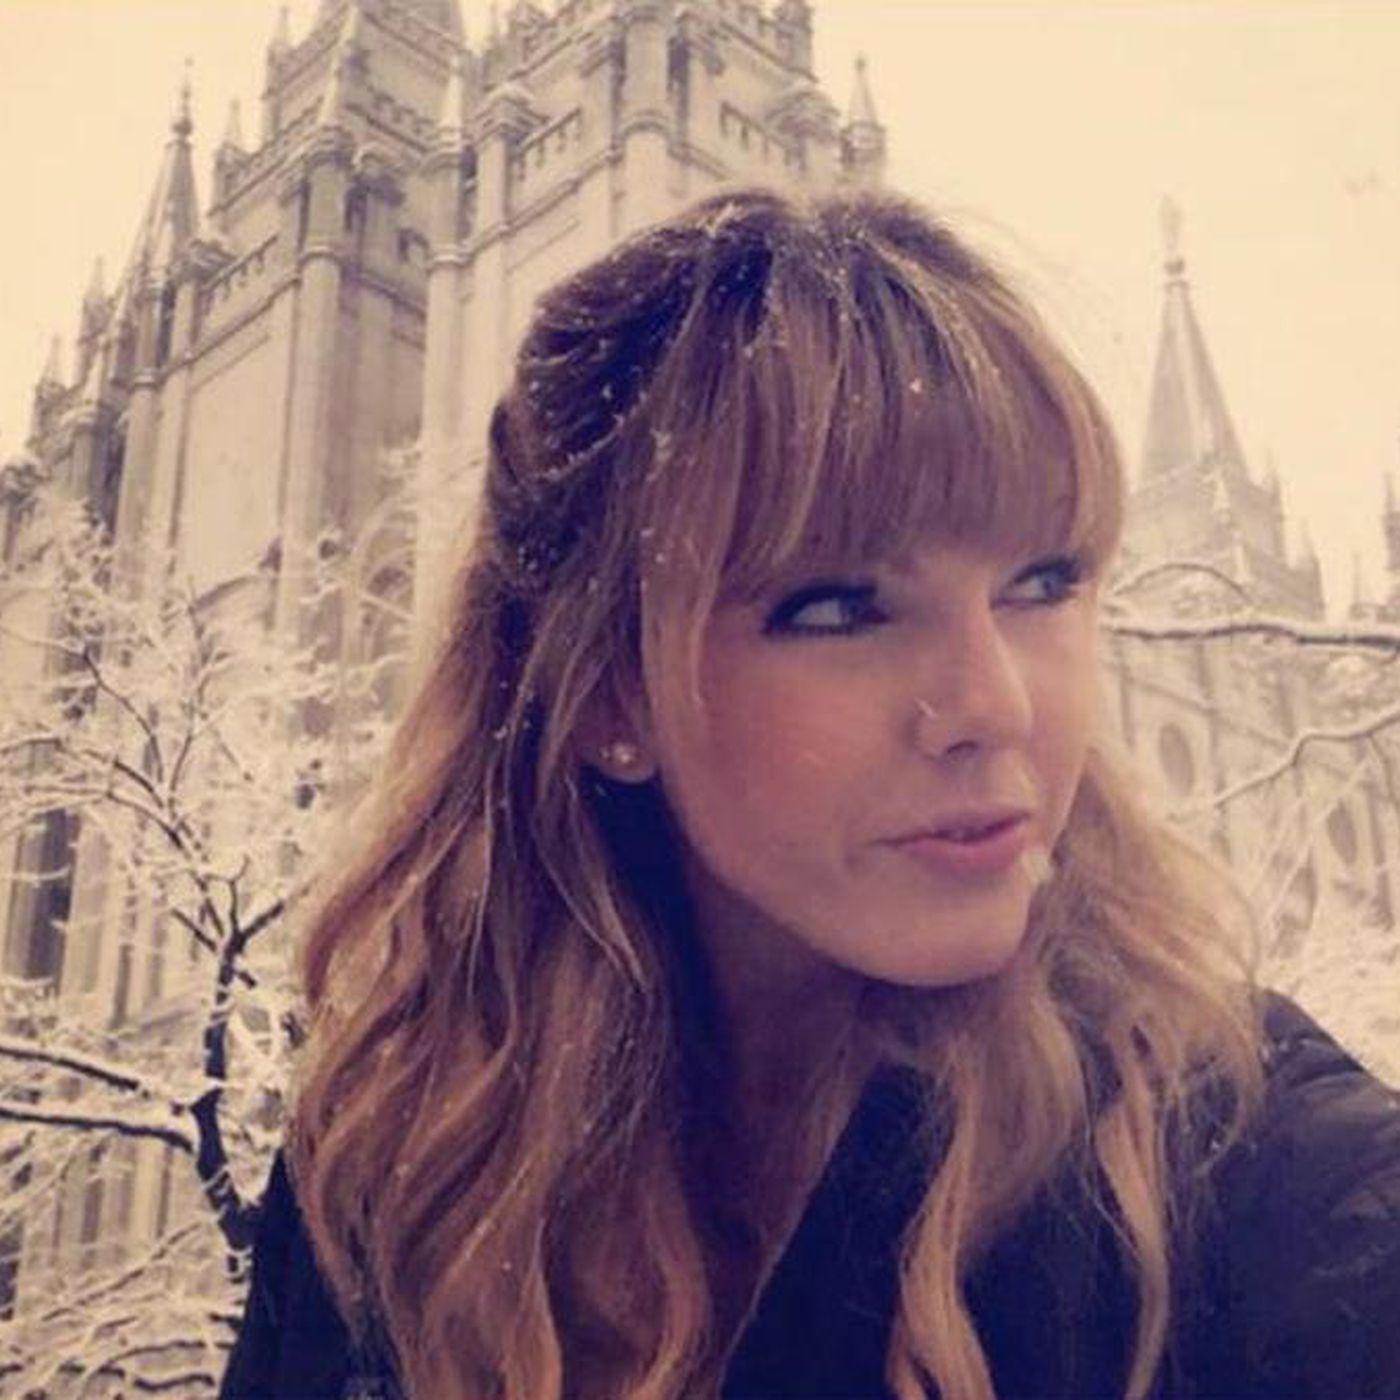 Mormon Taylor Swift Look Alike Draws National Attention Talks Self Worth Divine Identity Deseret News